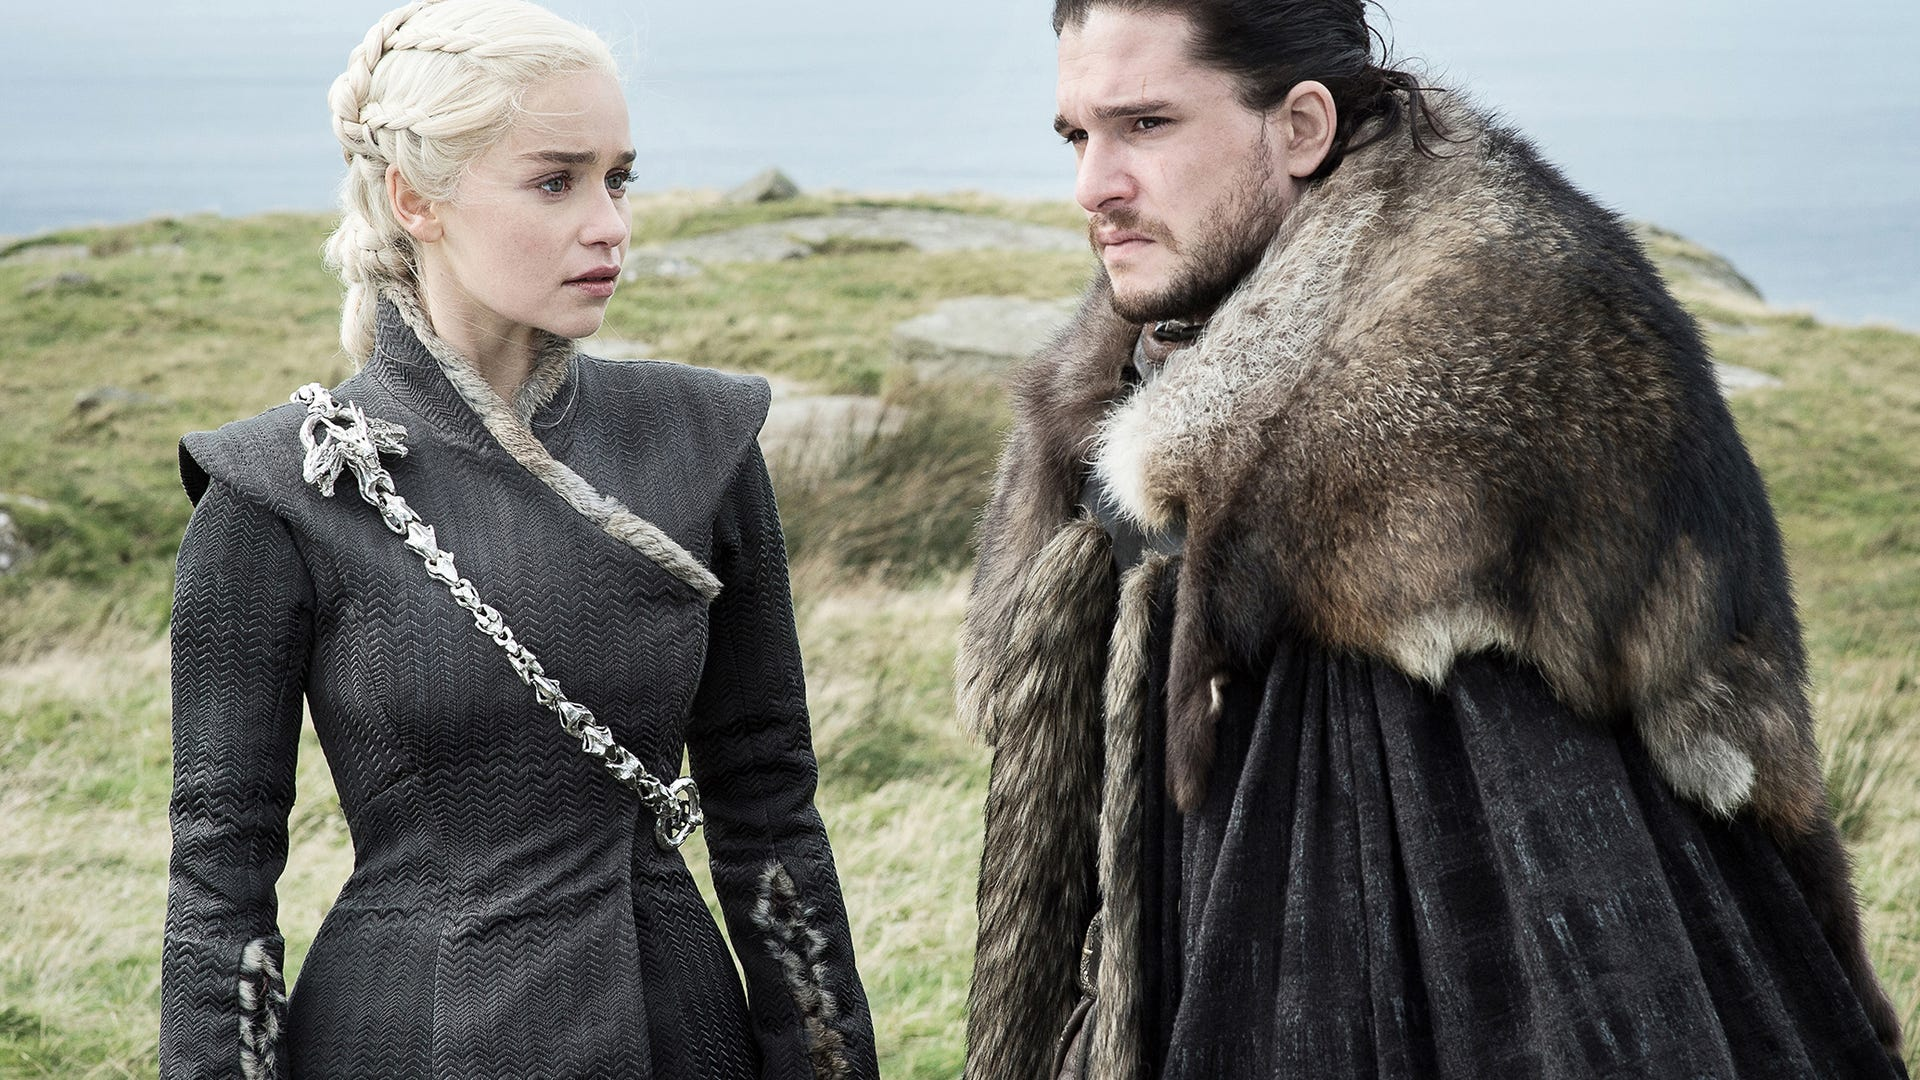 Emilia Clarke and Kit Harington, Game of Thrones